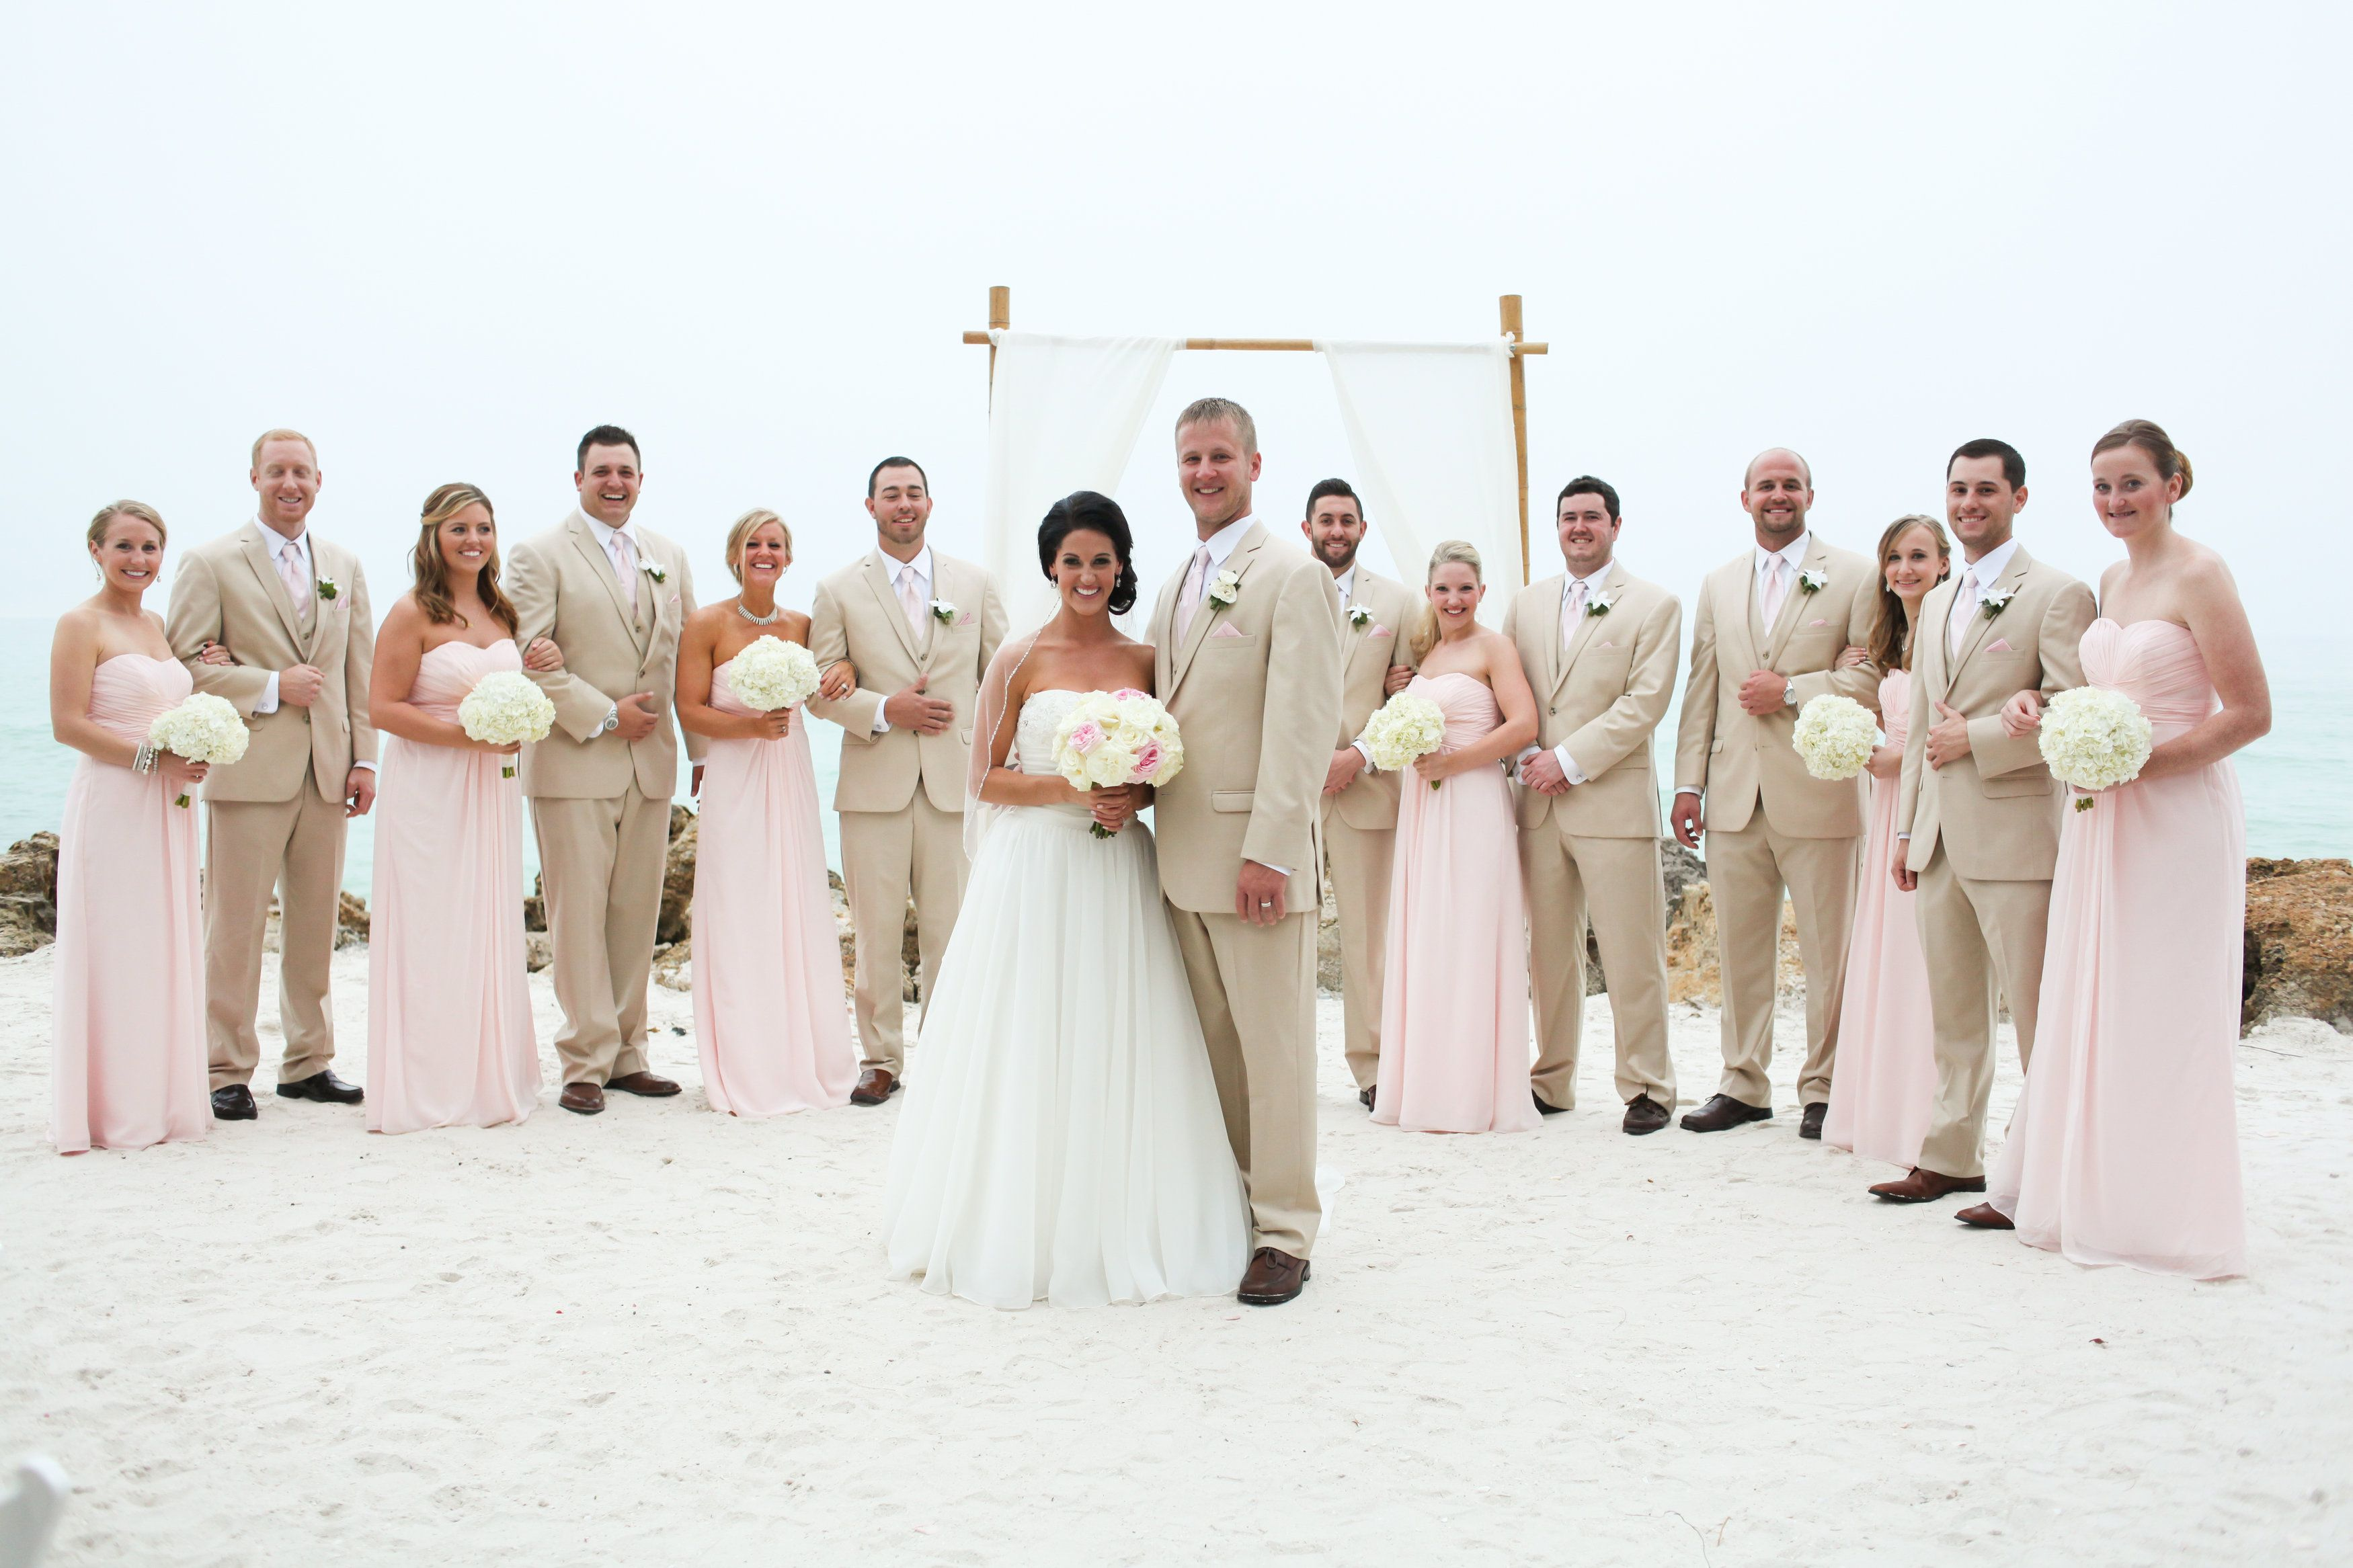 Blush Bridesmaids And Tan Groomsmen Suits Blush Beach Wedding